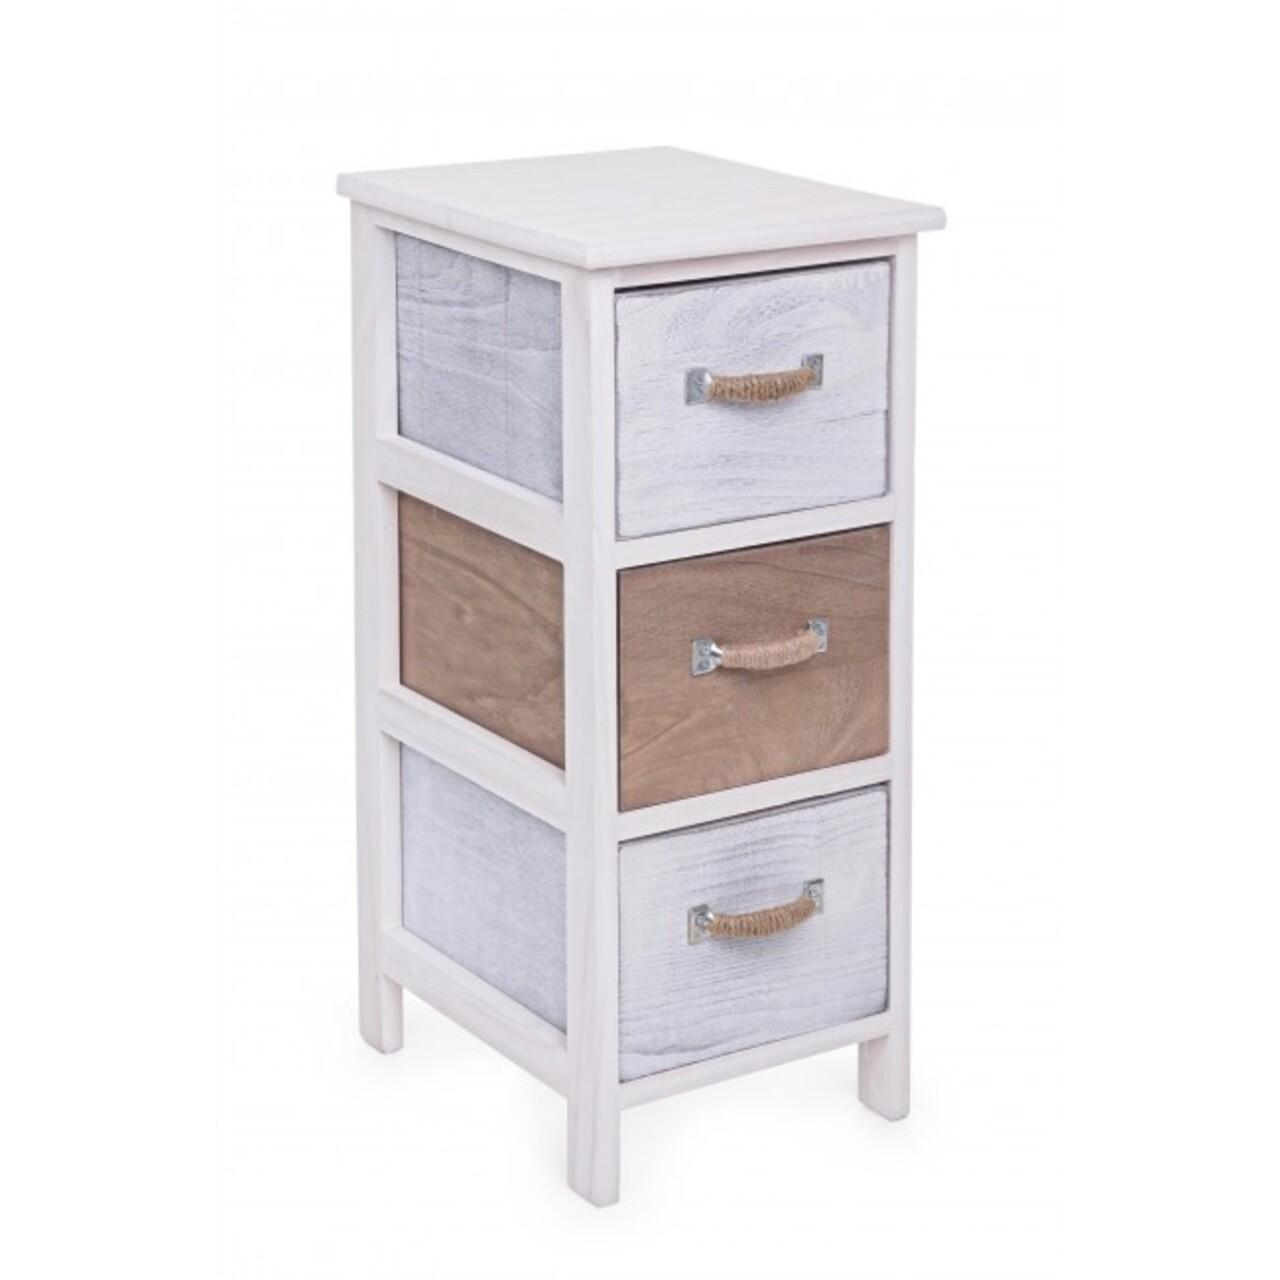 Comoda cu 3 sertare, Meredith, Bizzotto, 26x32x63 cm, lemn de paulownia